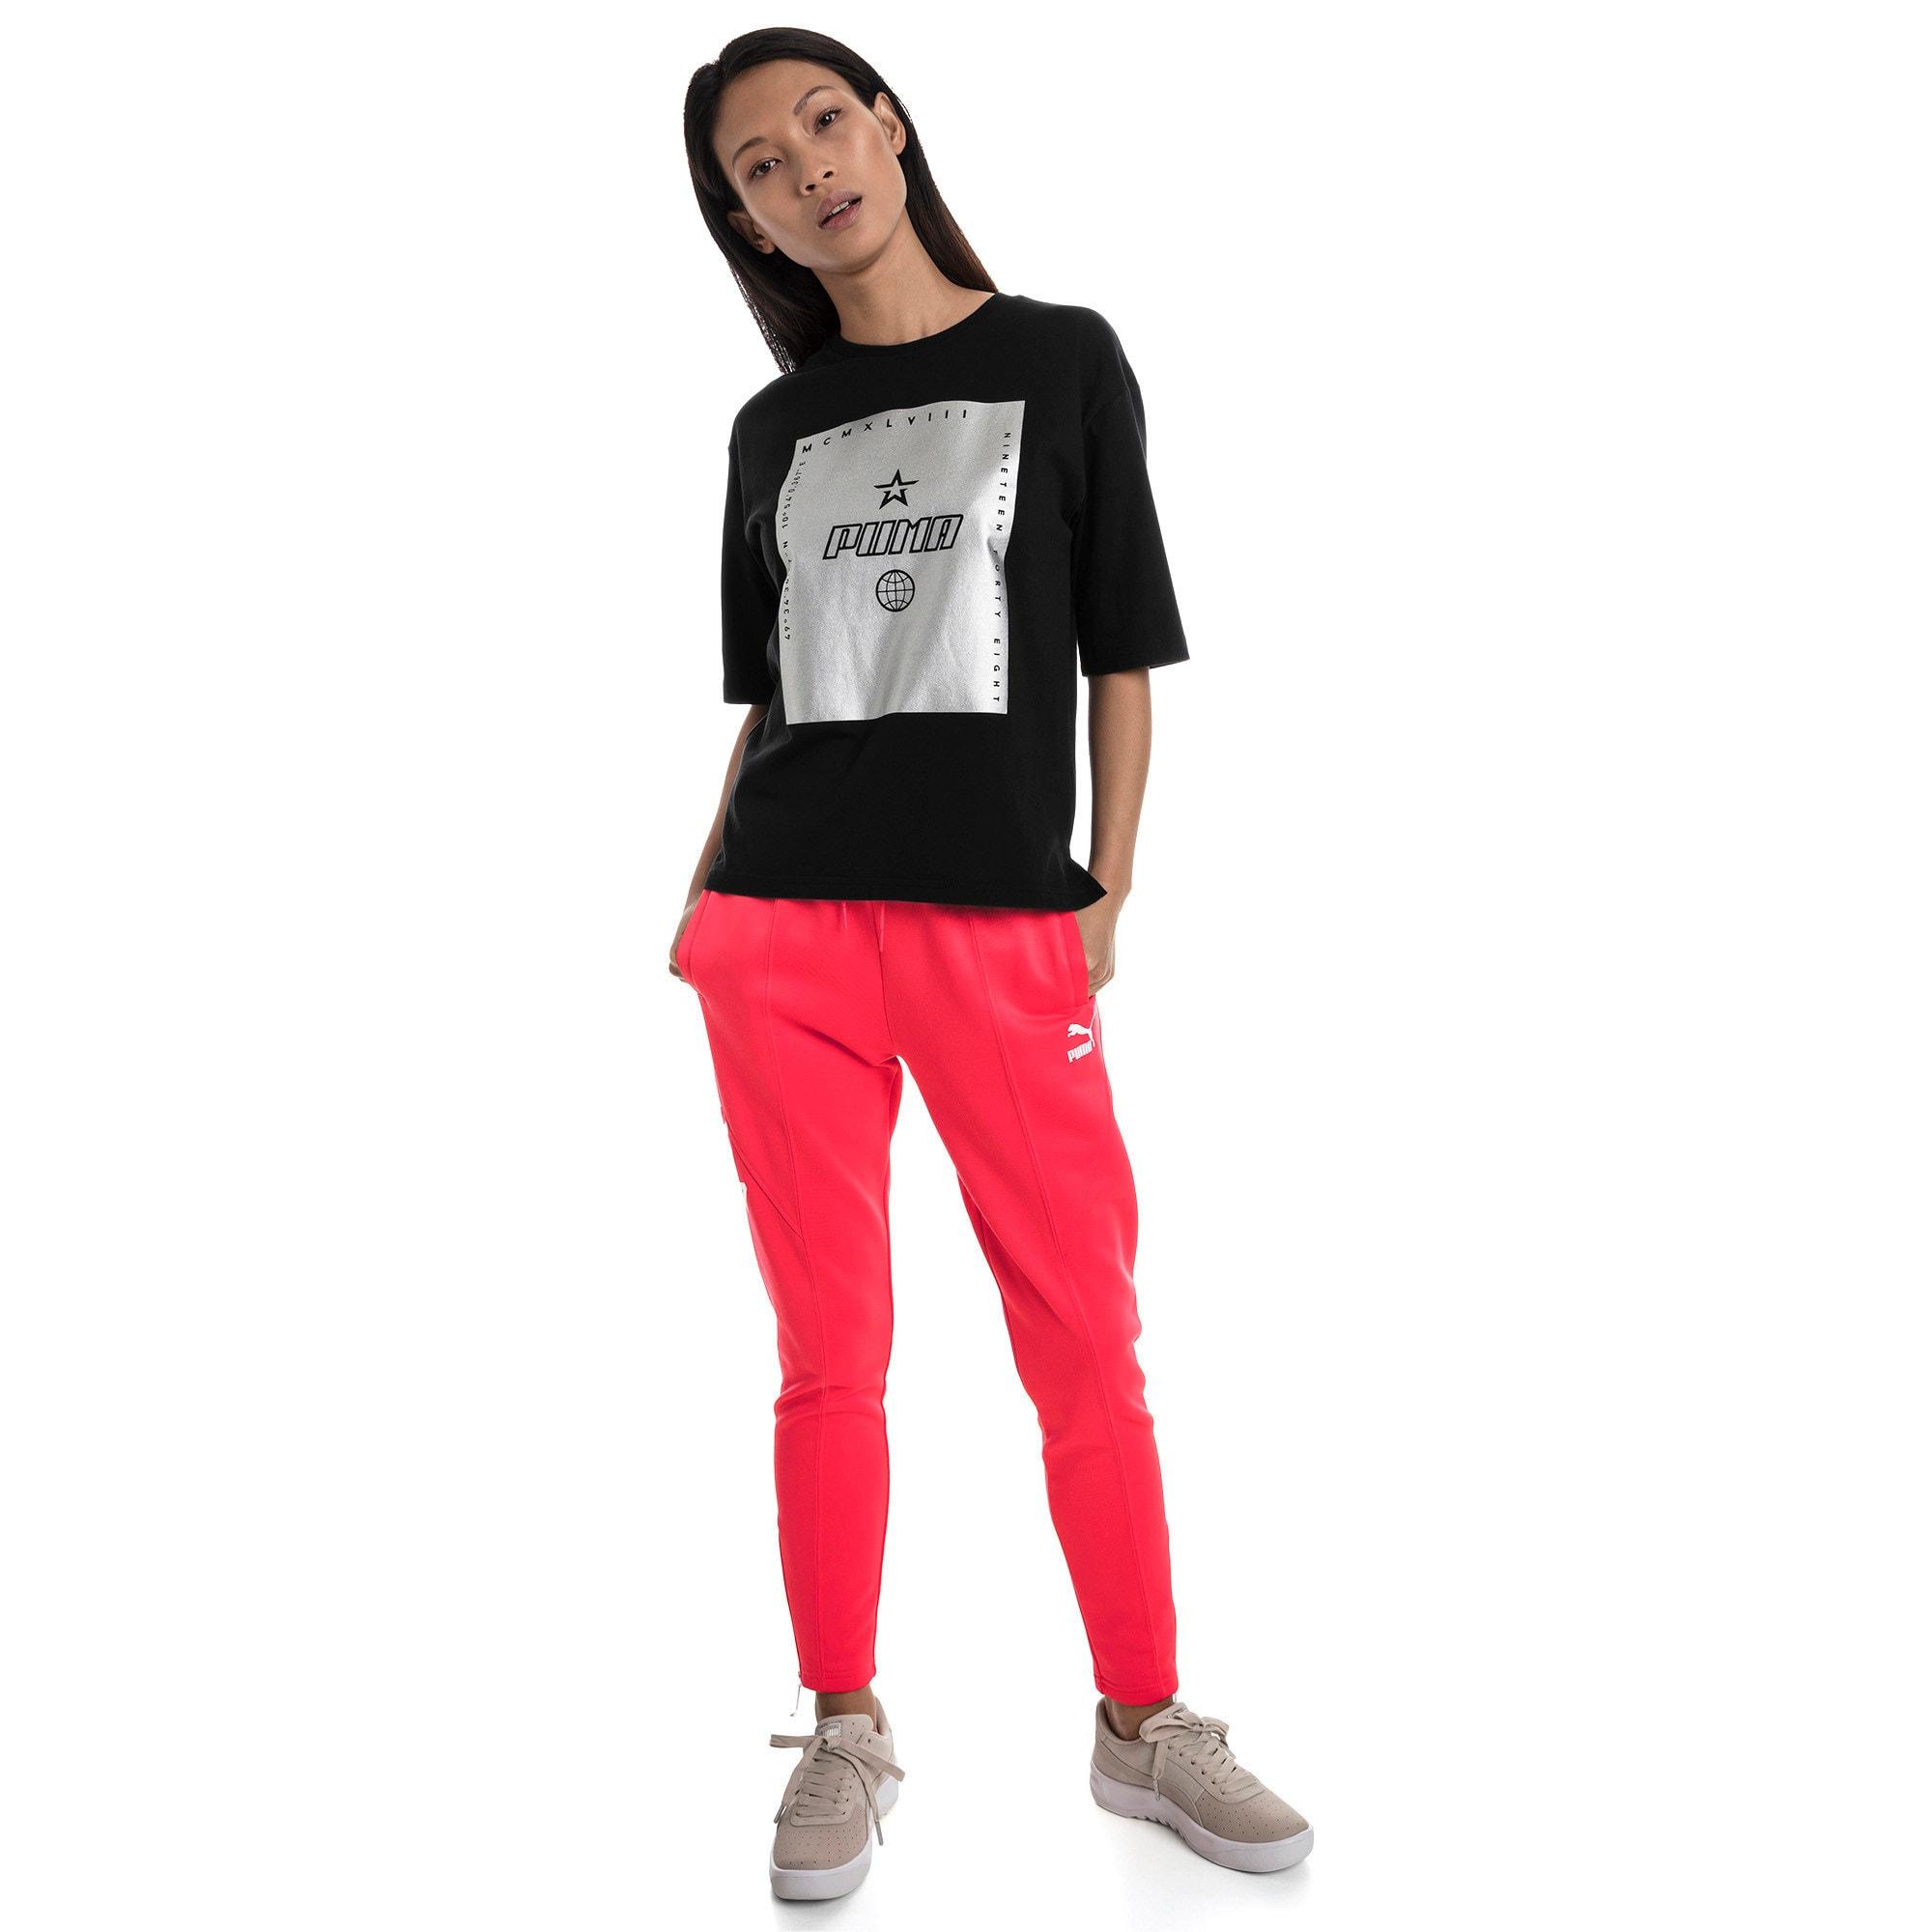 Miniatura 5 de Camiseta Trailblazer para mujer, Cotton Black, mediano